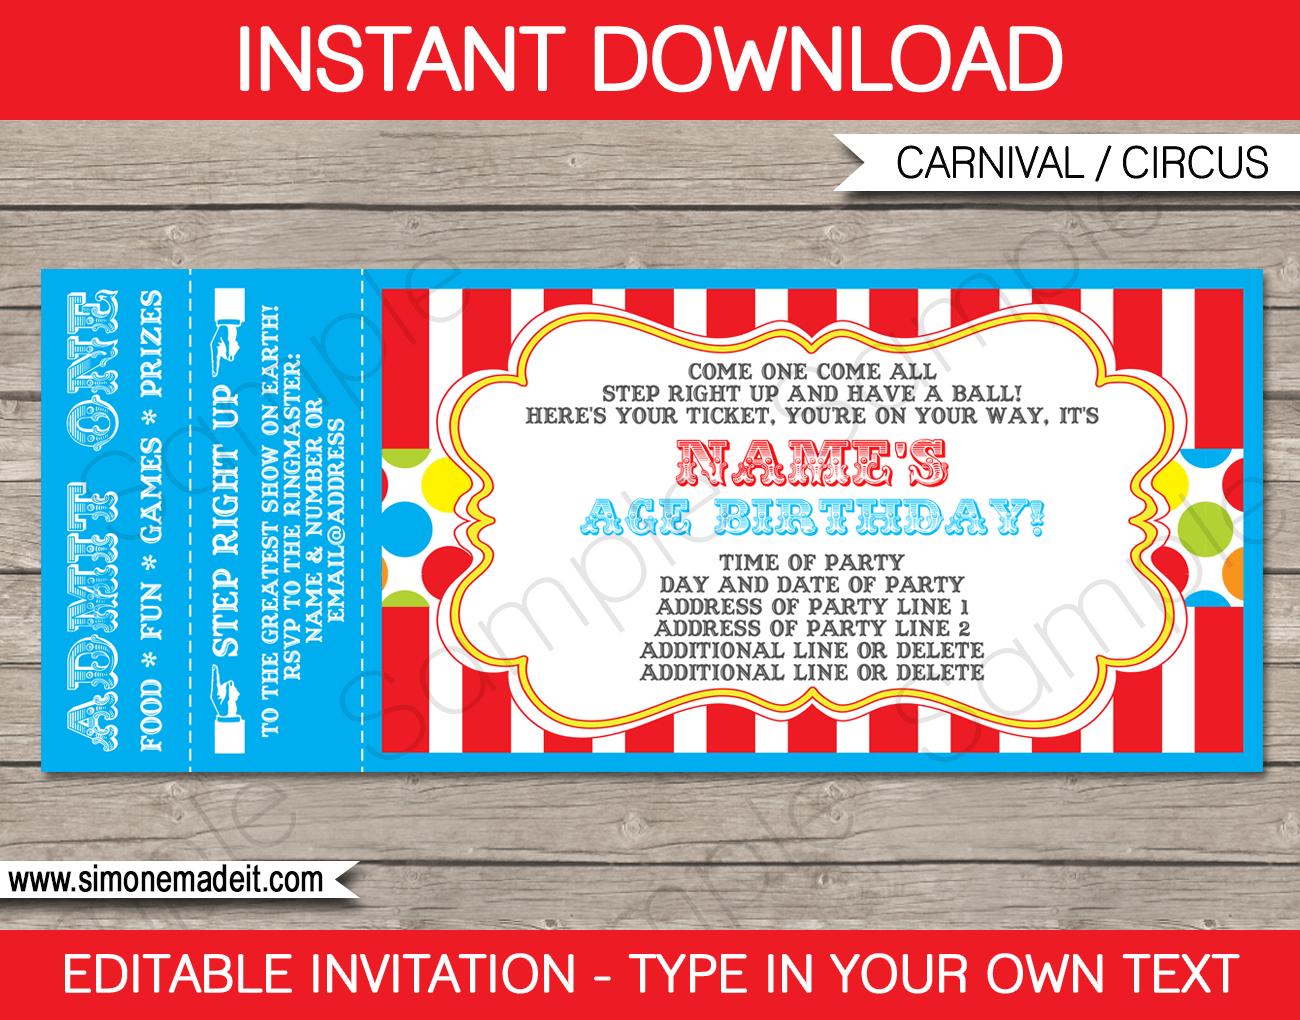 Ticket Invitation Maker - Kaza.psstech.co - Free Printable Movie Ticket Birthday Party Invitations